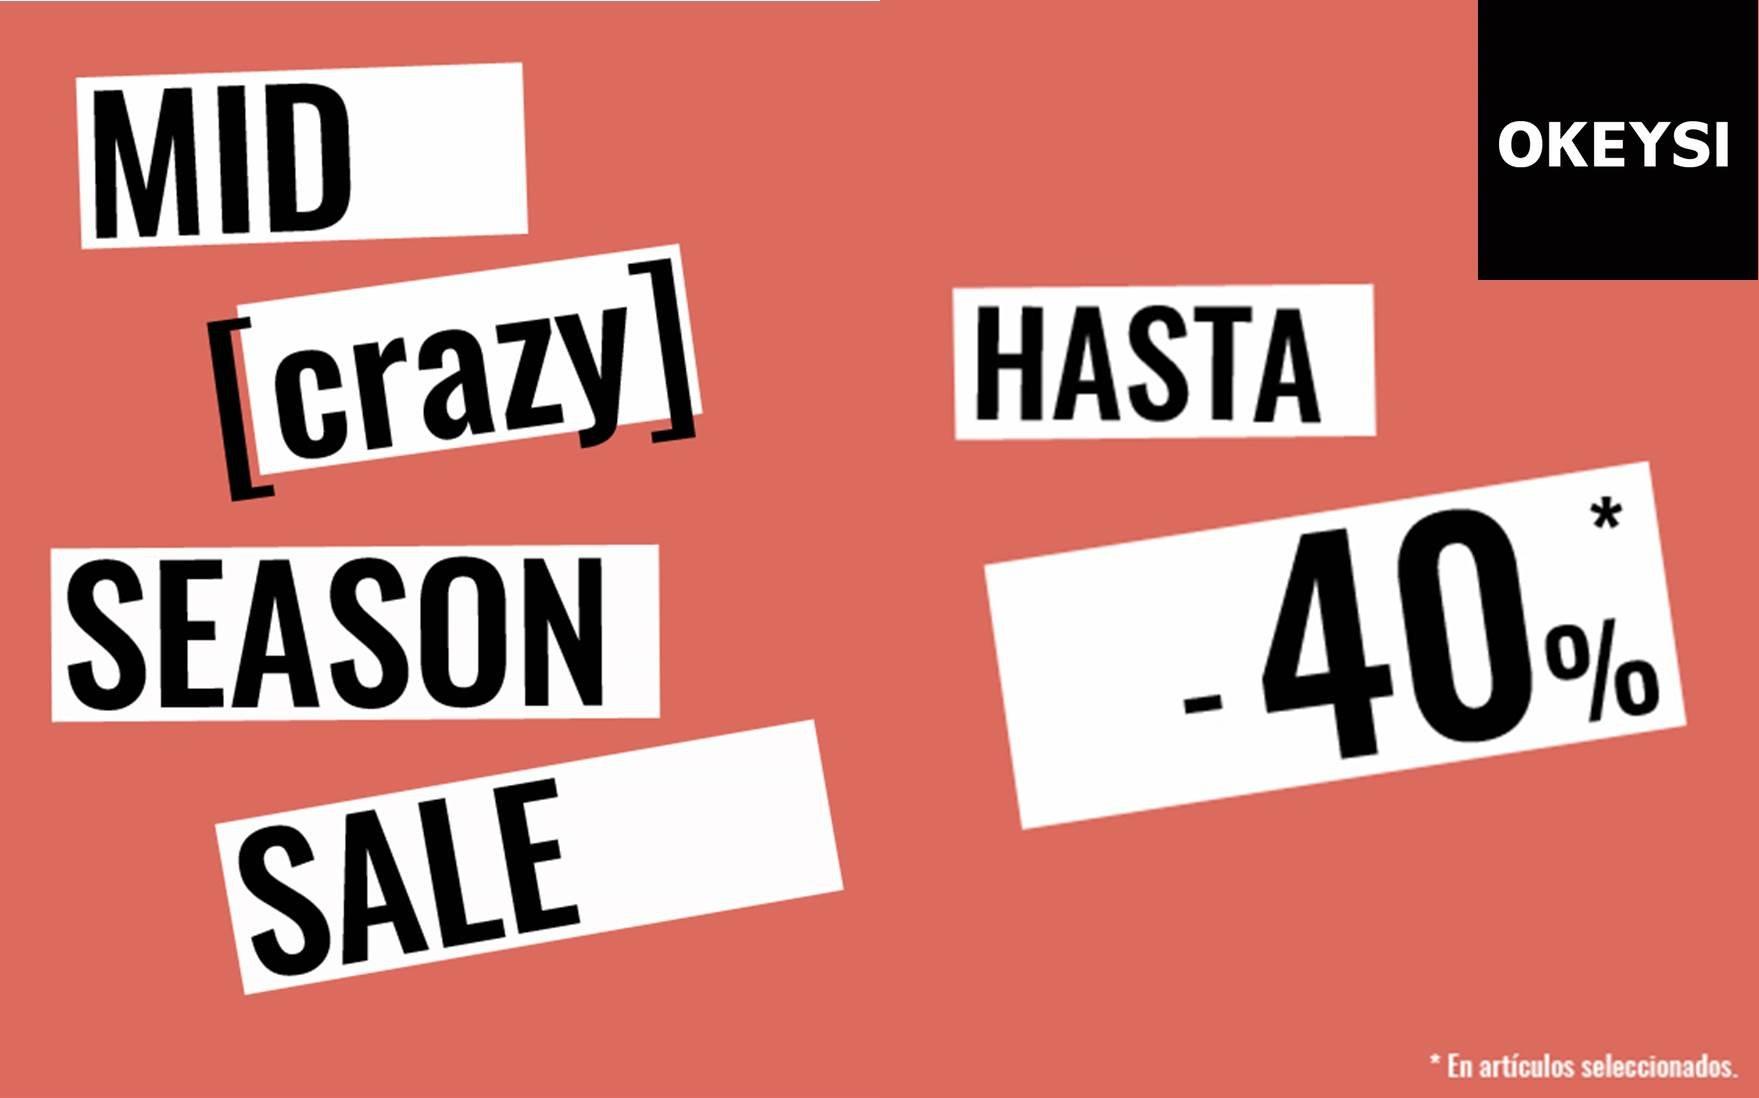 mid-crazy-season-sale